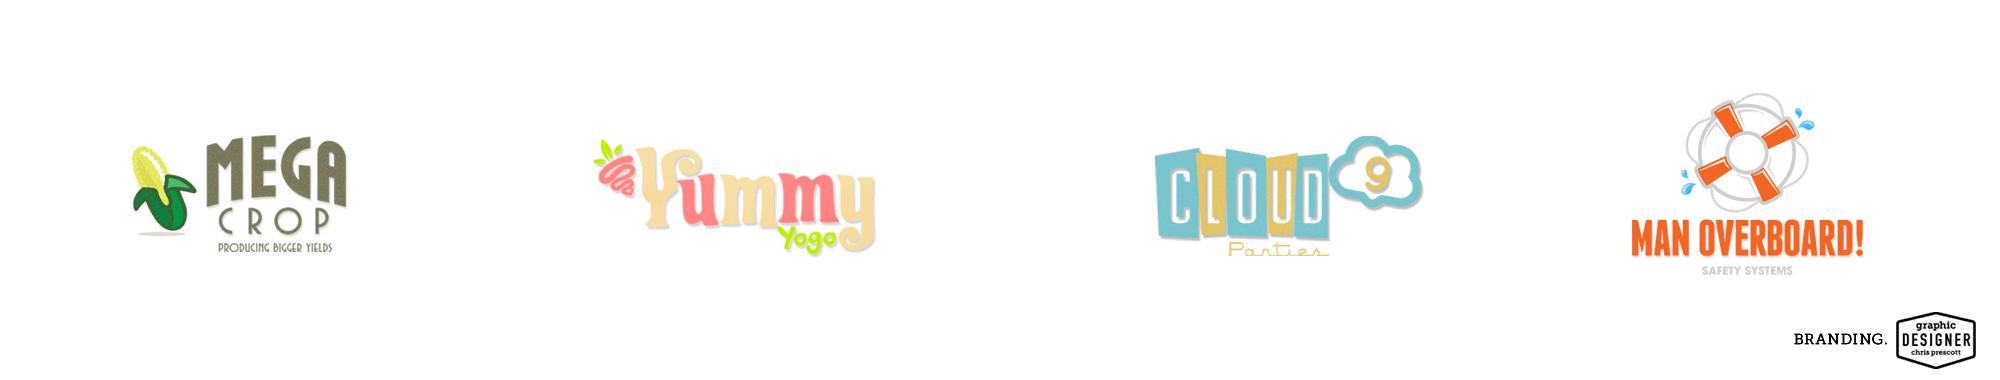 Milwaukee Logo / Branding Design • Graphic Designer Chris Prescott